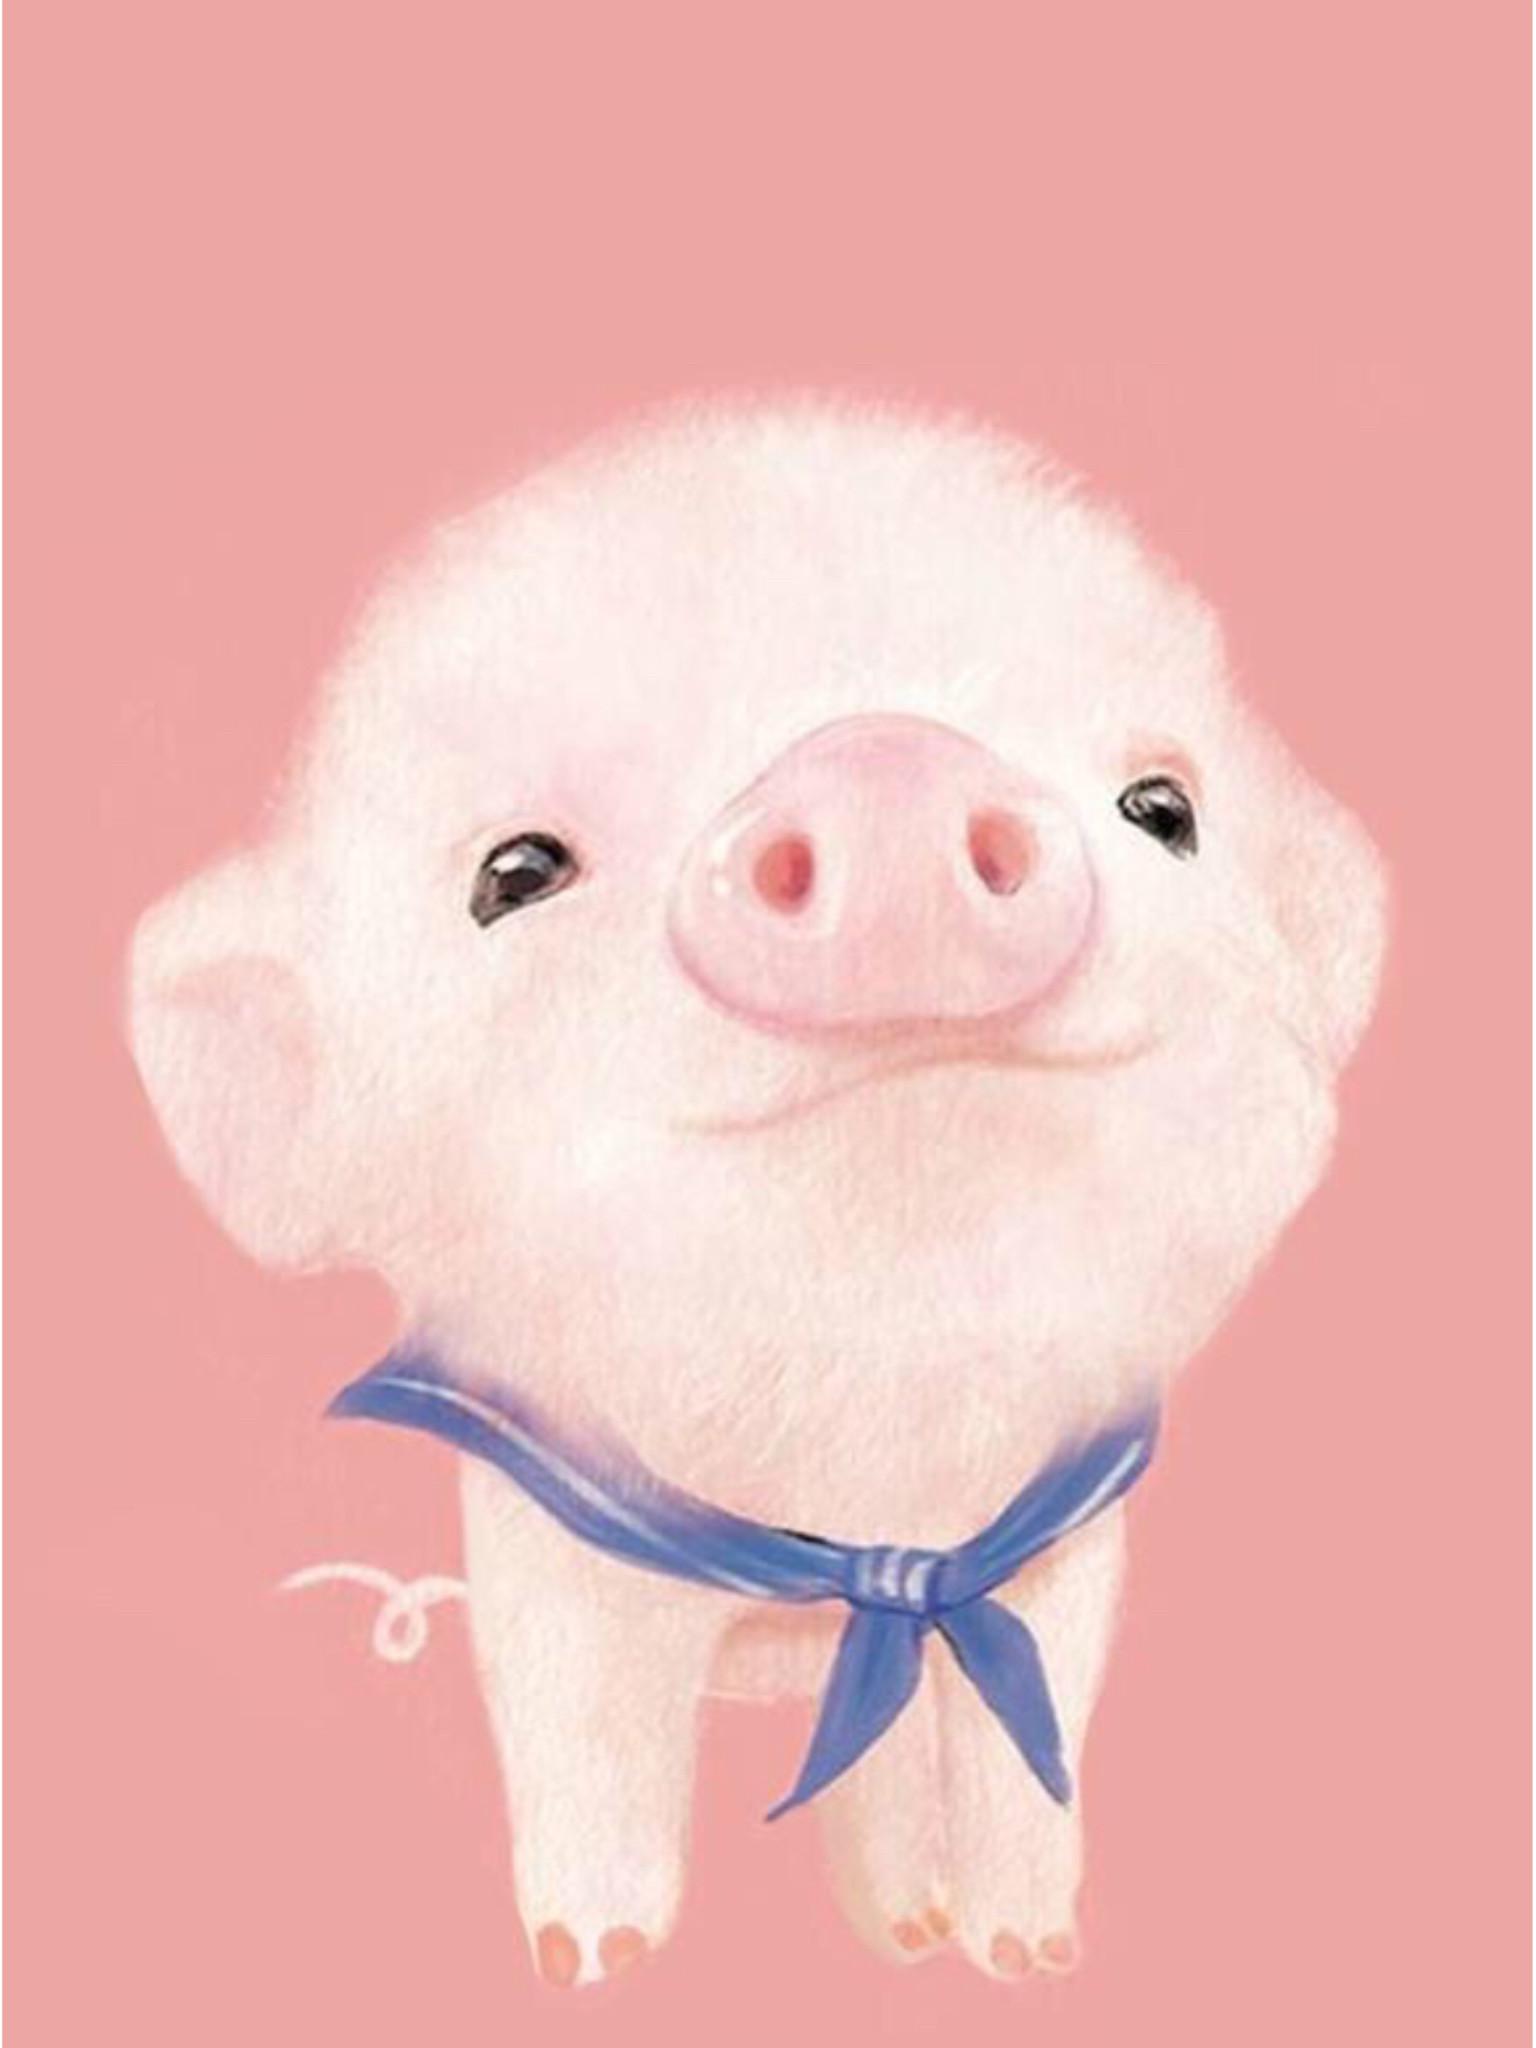 Cute Piglets Wallpaper Piglet Backgrounds 53 Images